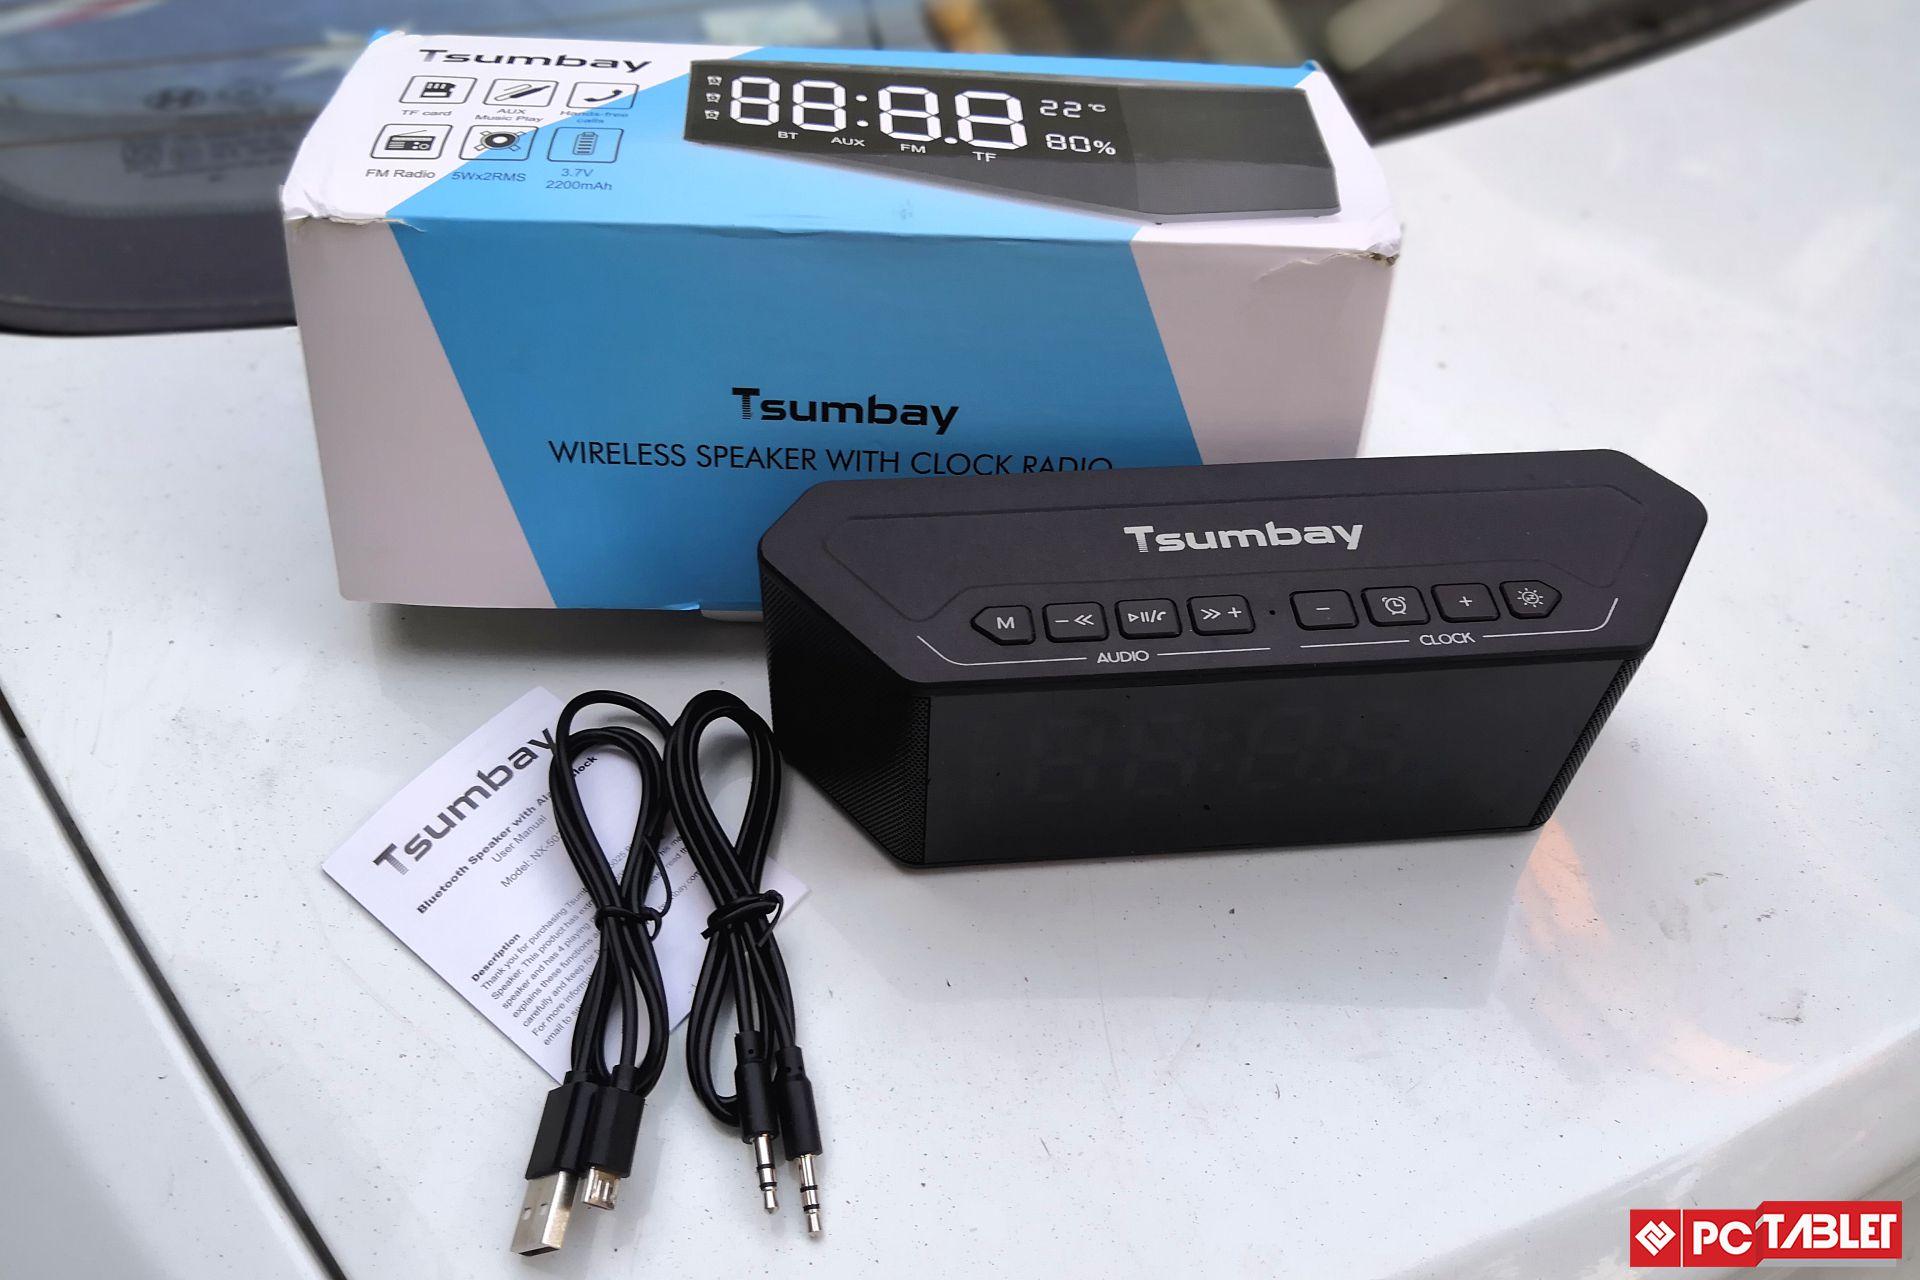 Tsumbay NX 5025 Bluetooth speaker 2